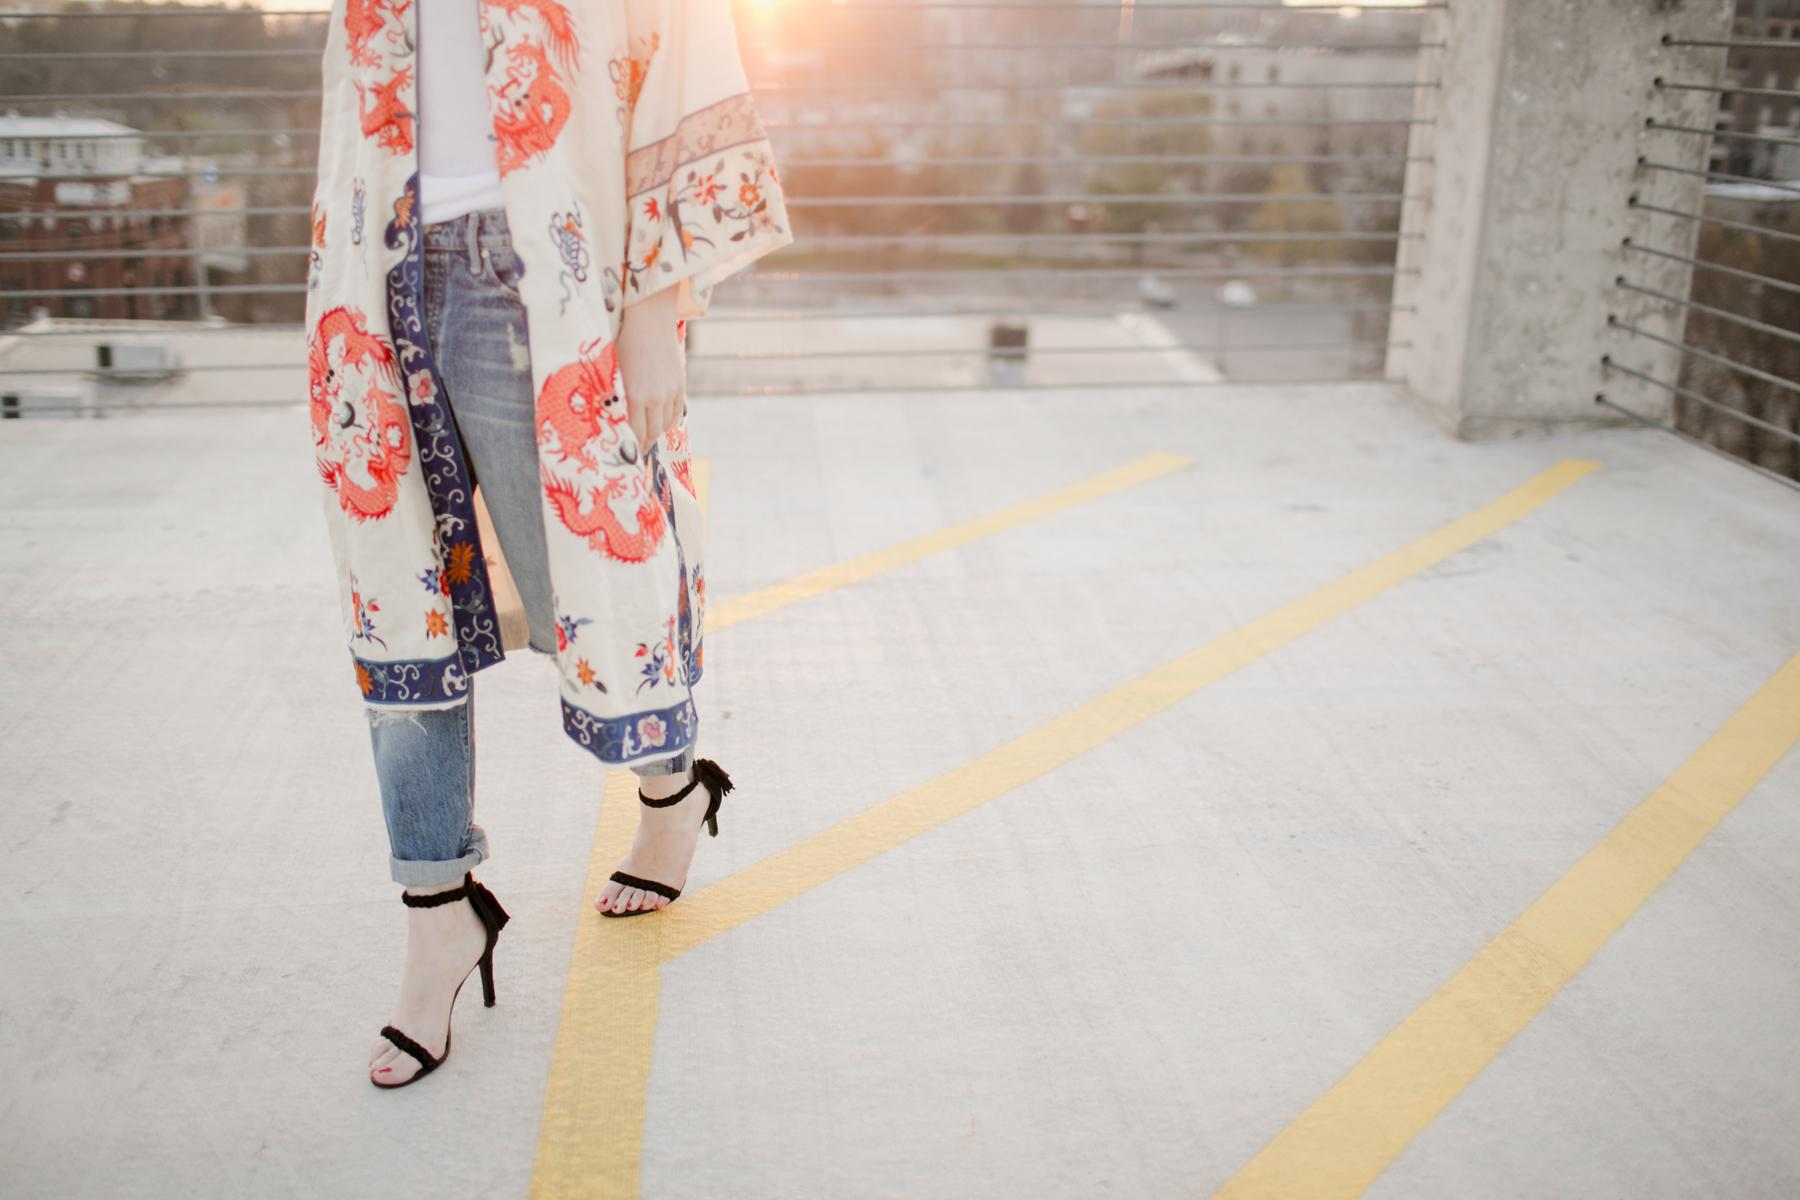 Eldridge_Edit_Anna_E_Cottrell_Tulip_Louise_Fashion_Blogger_Kimono_Deconstructed_Oversized_Boyfriend_Jean_Denim_Mother-White_T-shirt_Tom_Ford_Glasses_Joie_Heel_6.jpg